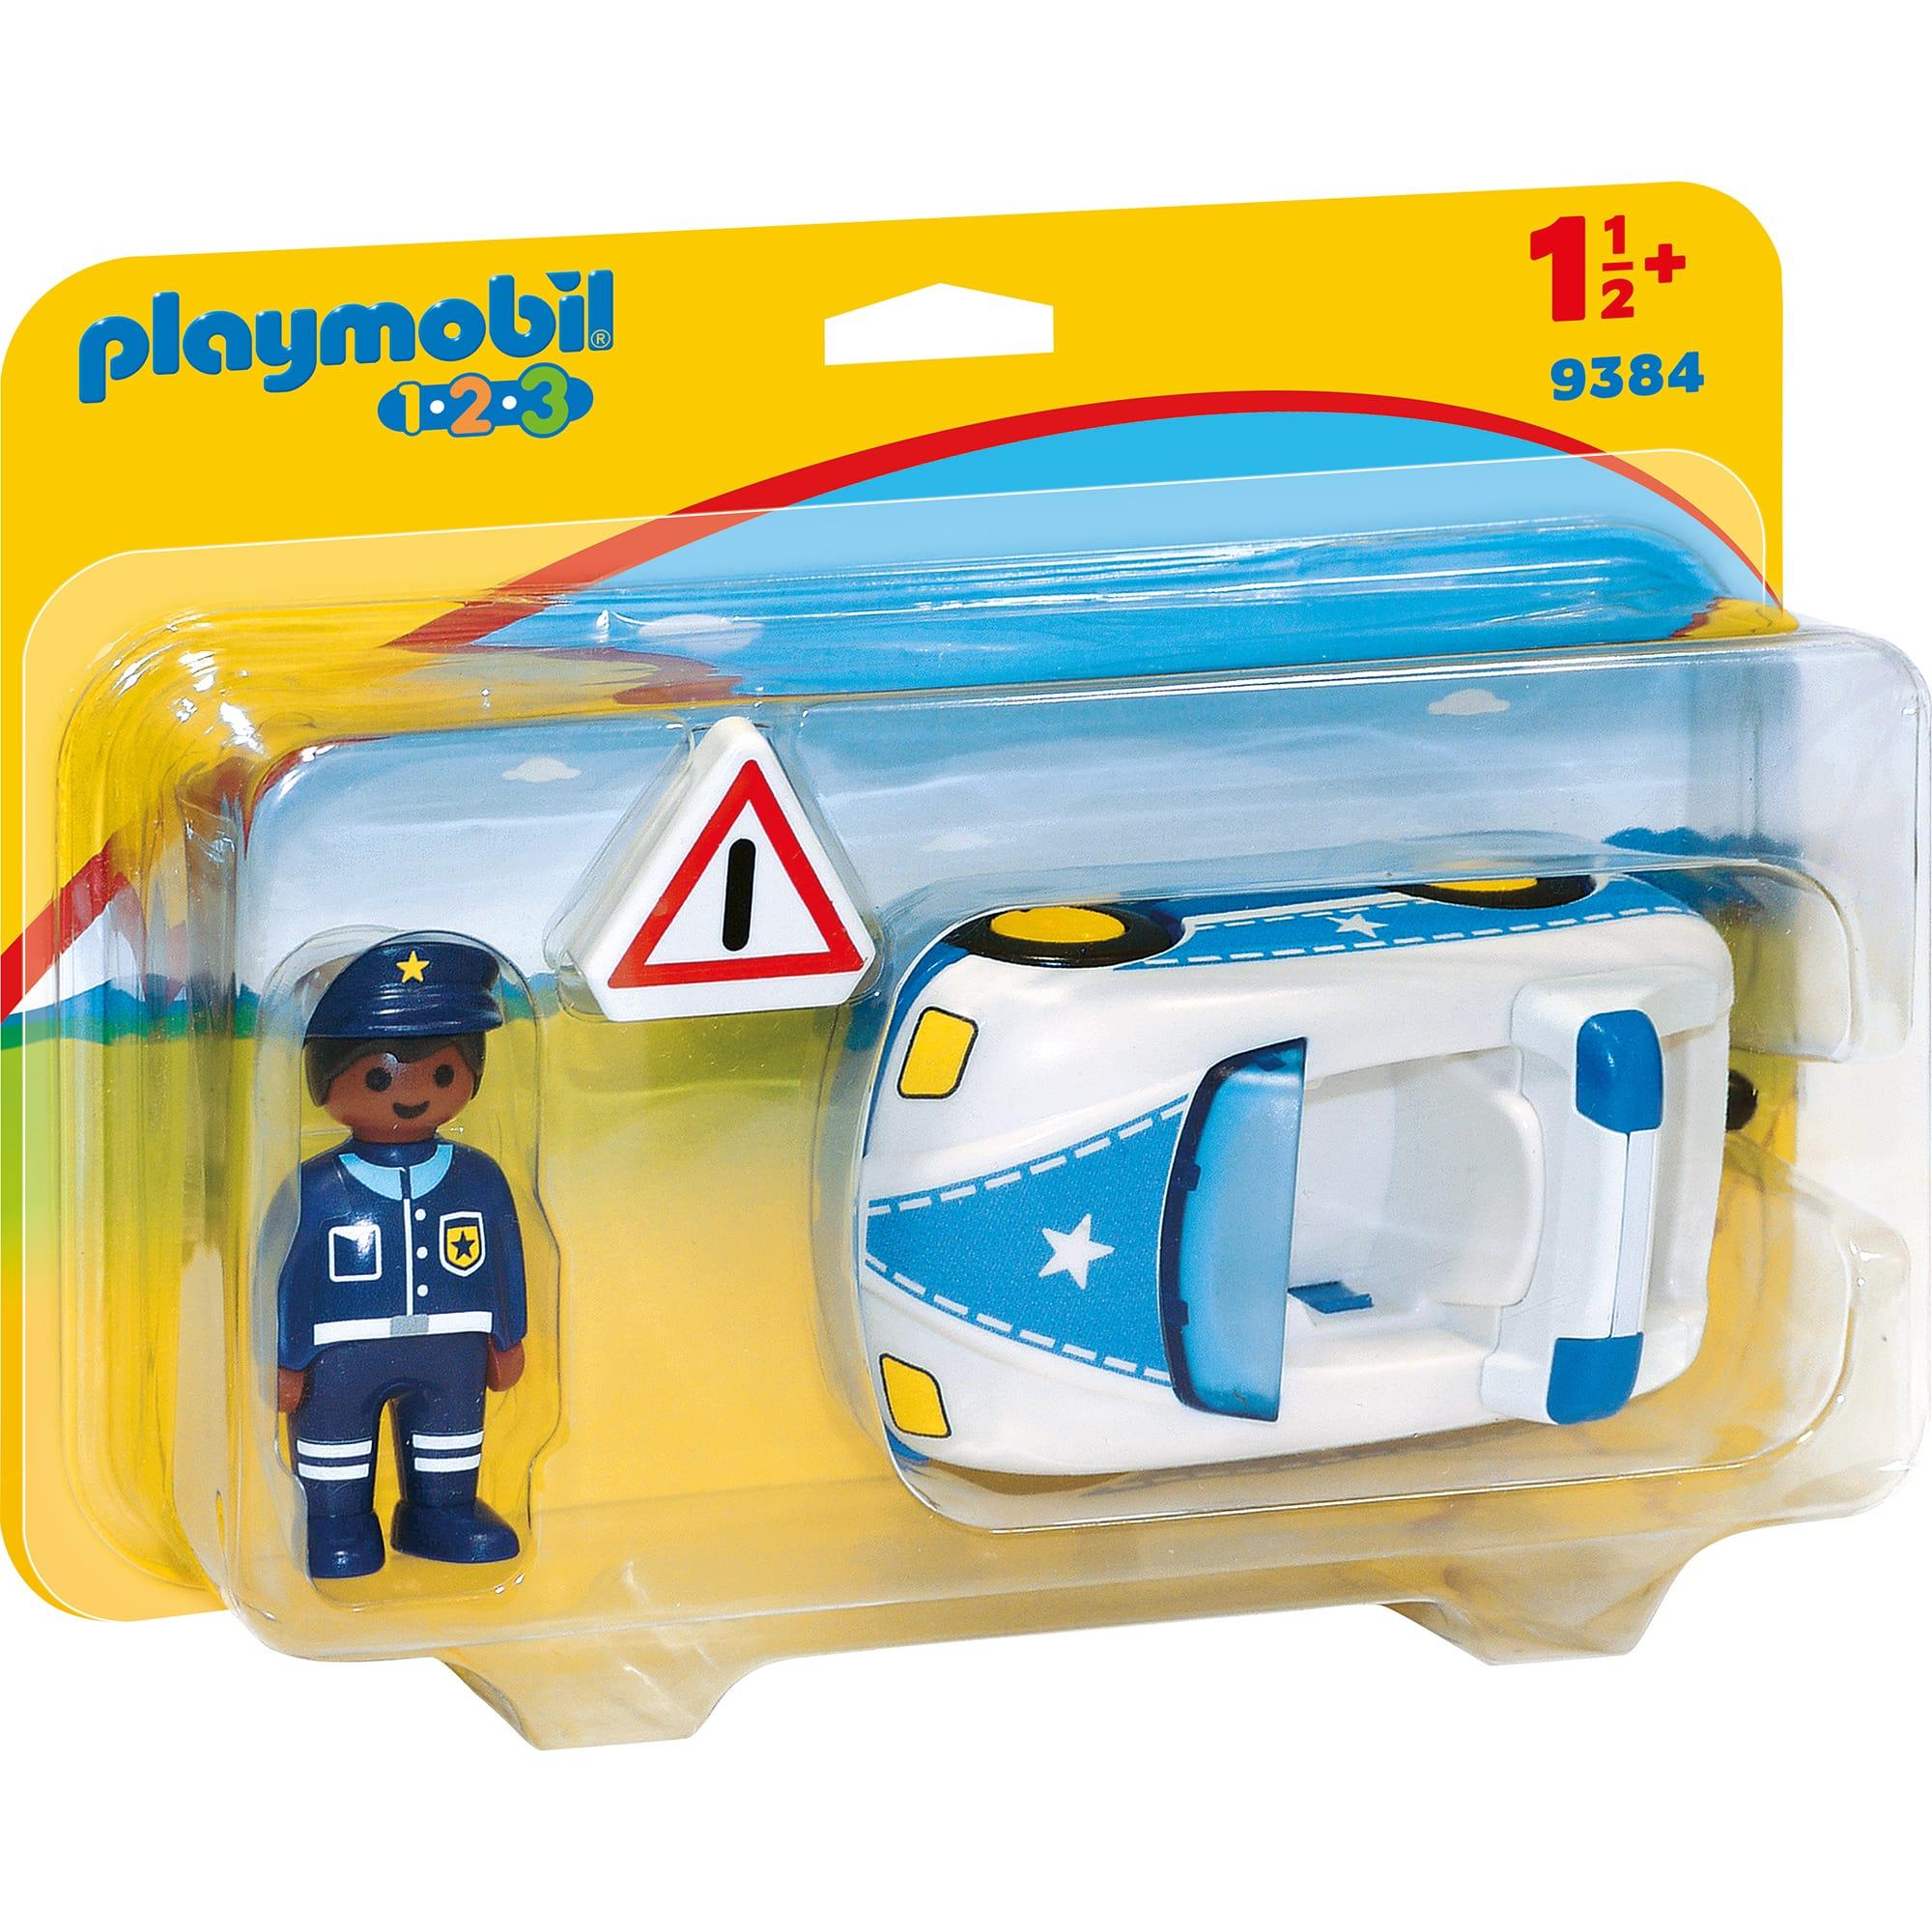 Fotografie Playmobil 1.2.3 - Masina de politie